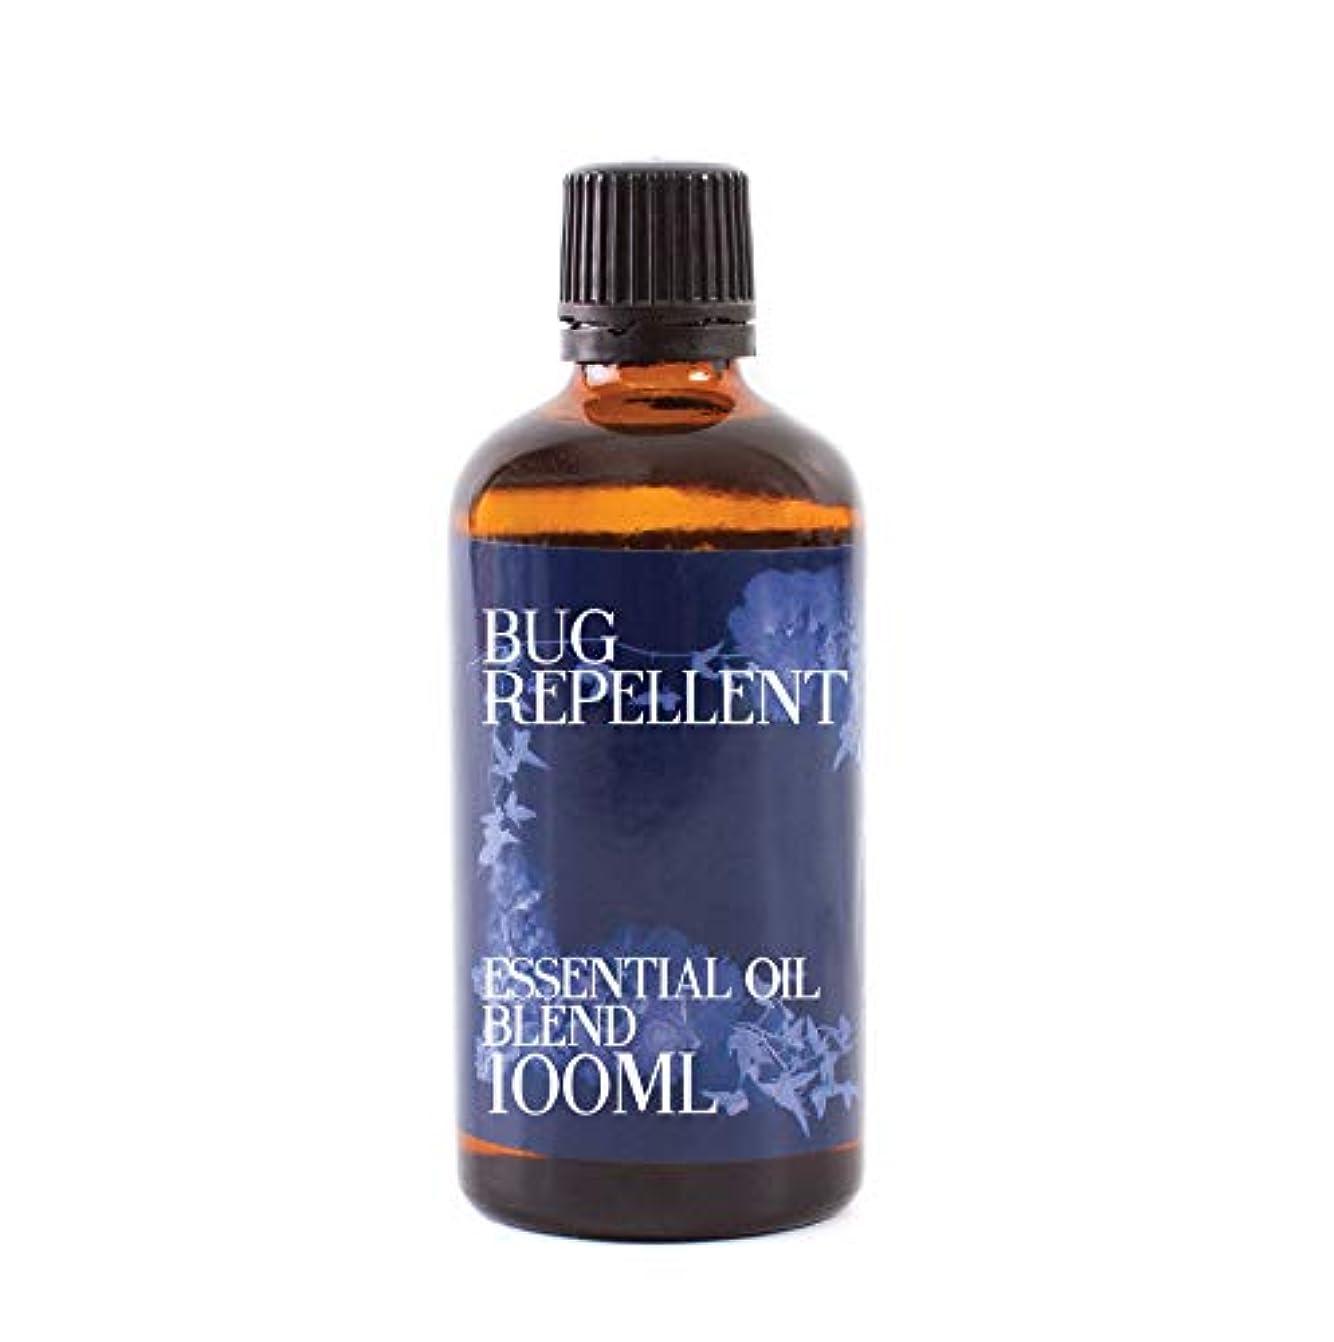 Mystix London | Bug Repellent Essential Oil Blend 100ml